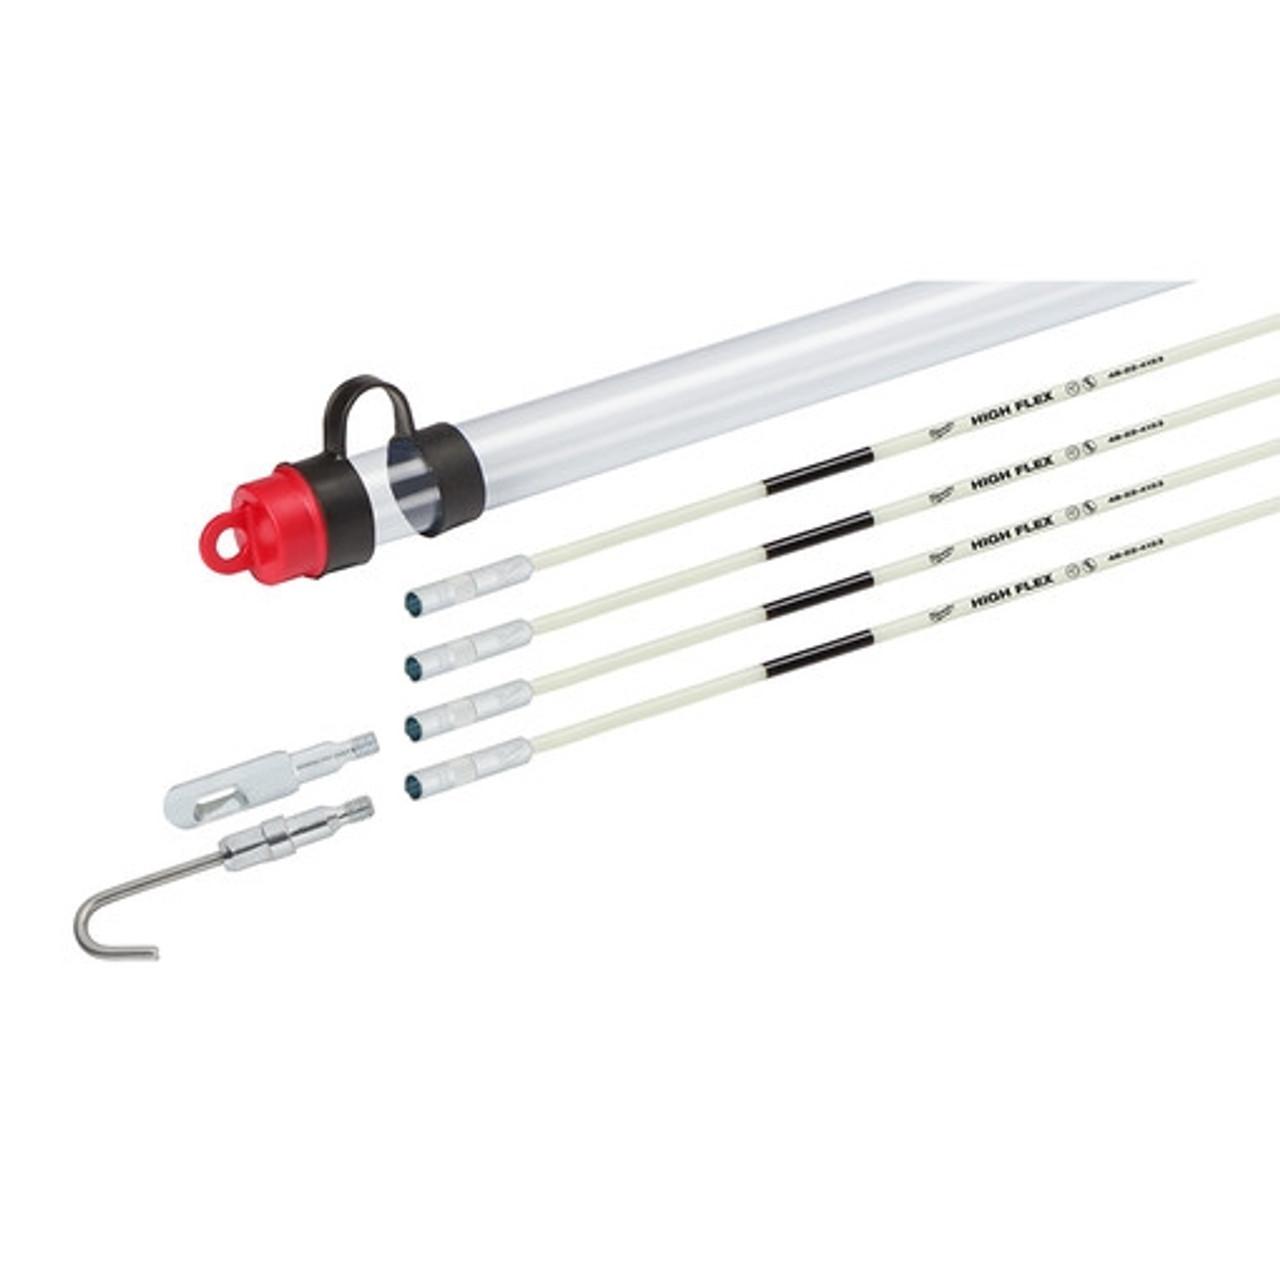 Milwaukee 48-22-4154 15 ft. High Flex Fish Stick Kit